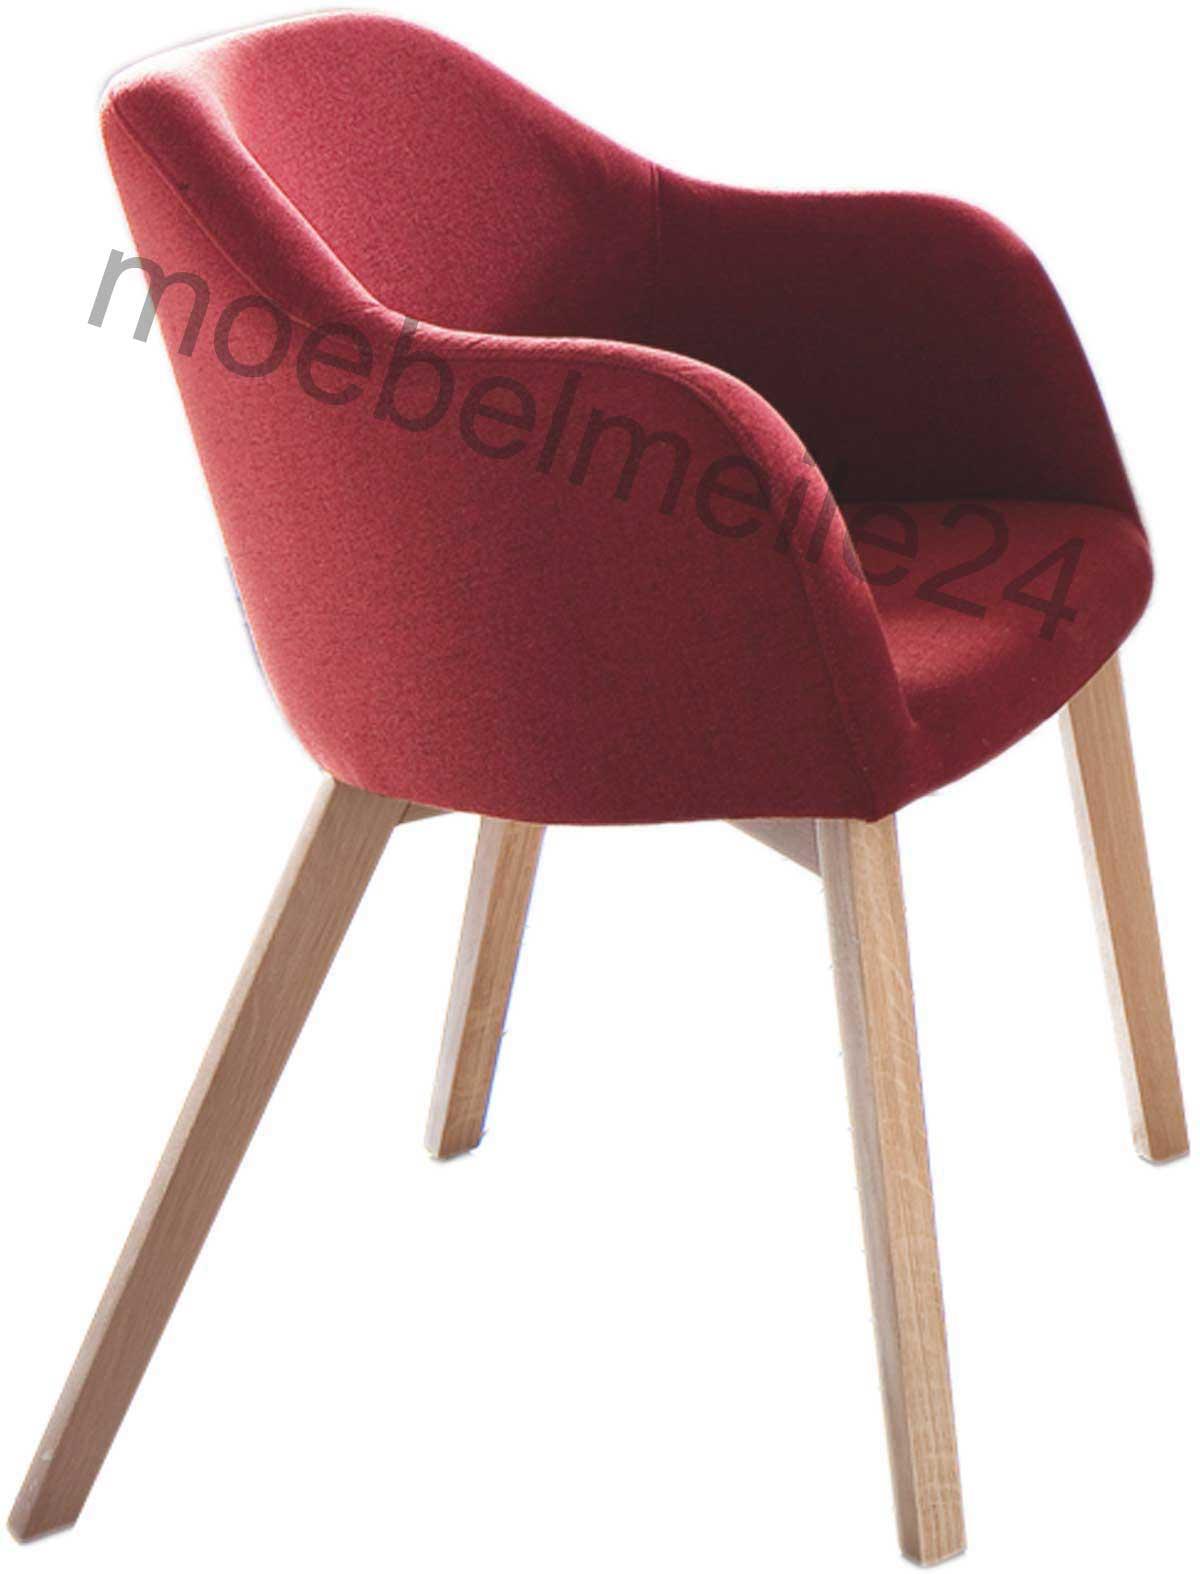 Standard Furniture Theo Schalensessel rot